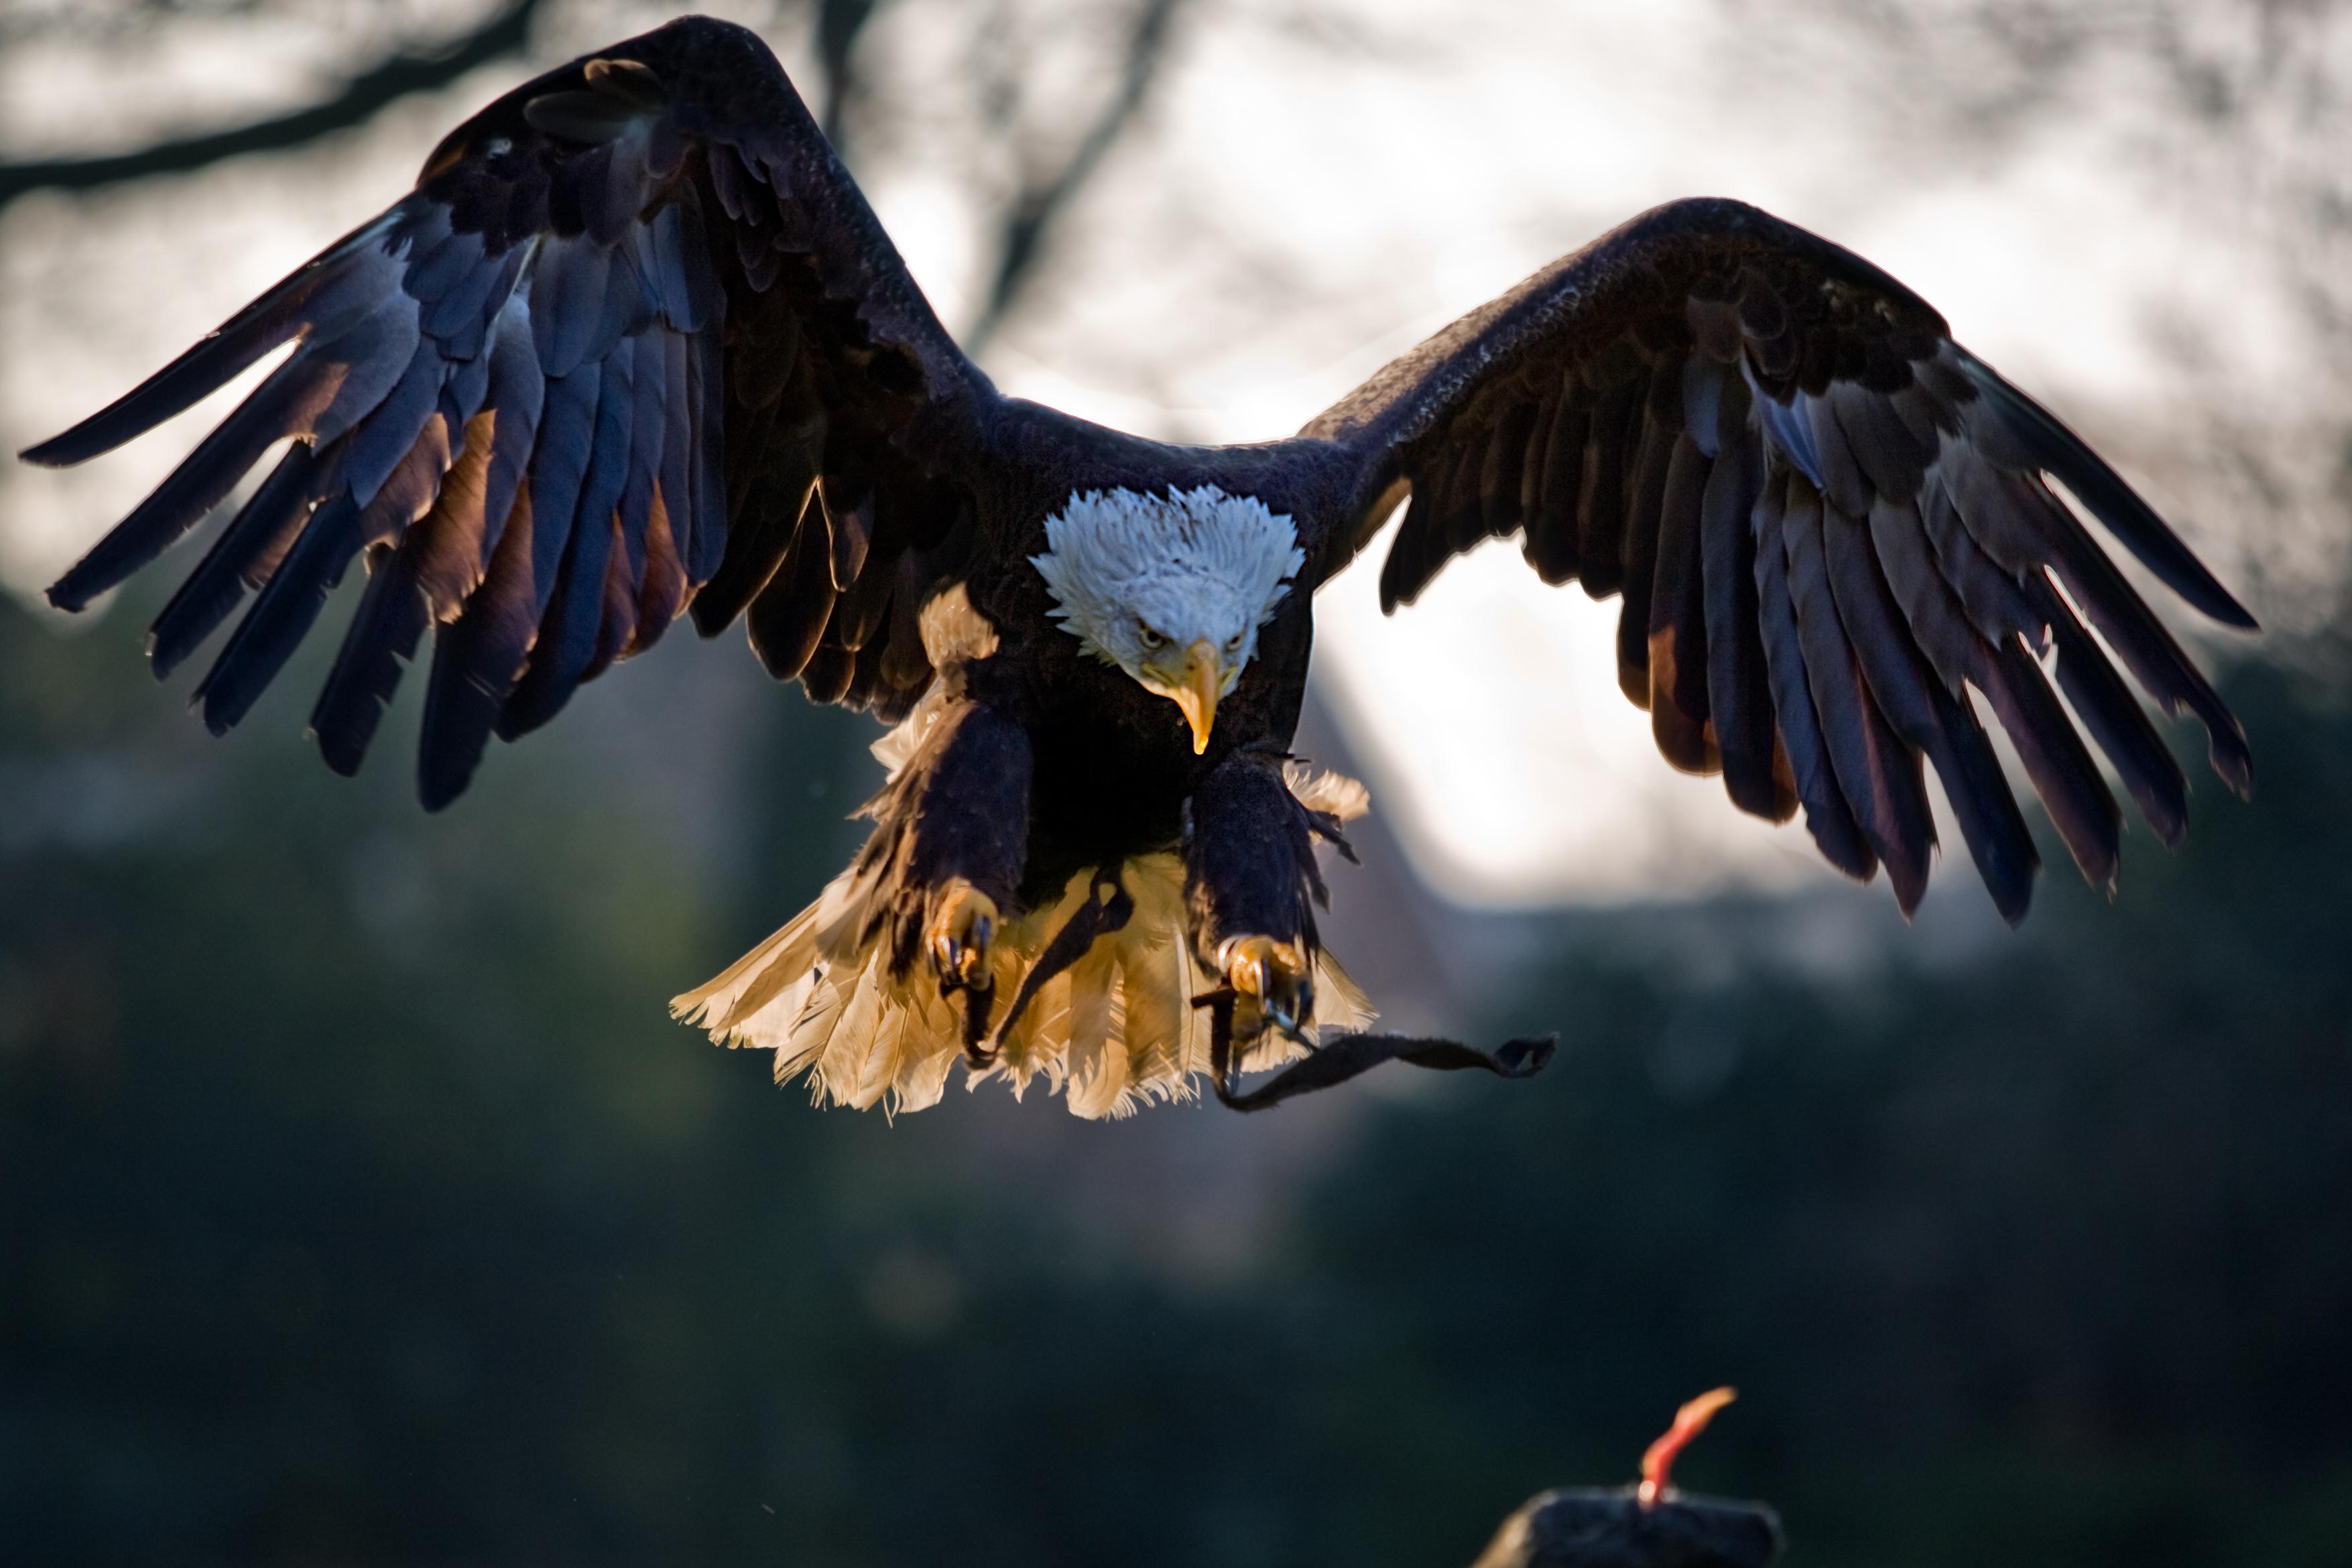 File:American Bald Eagle, landing.jpg - Wikimedia Commons